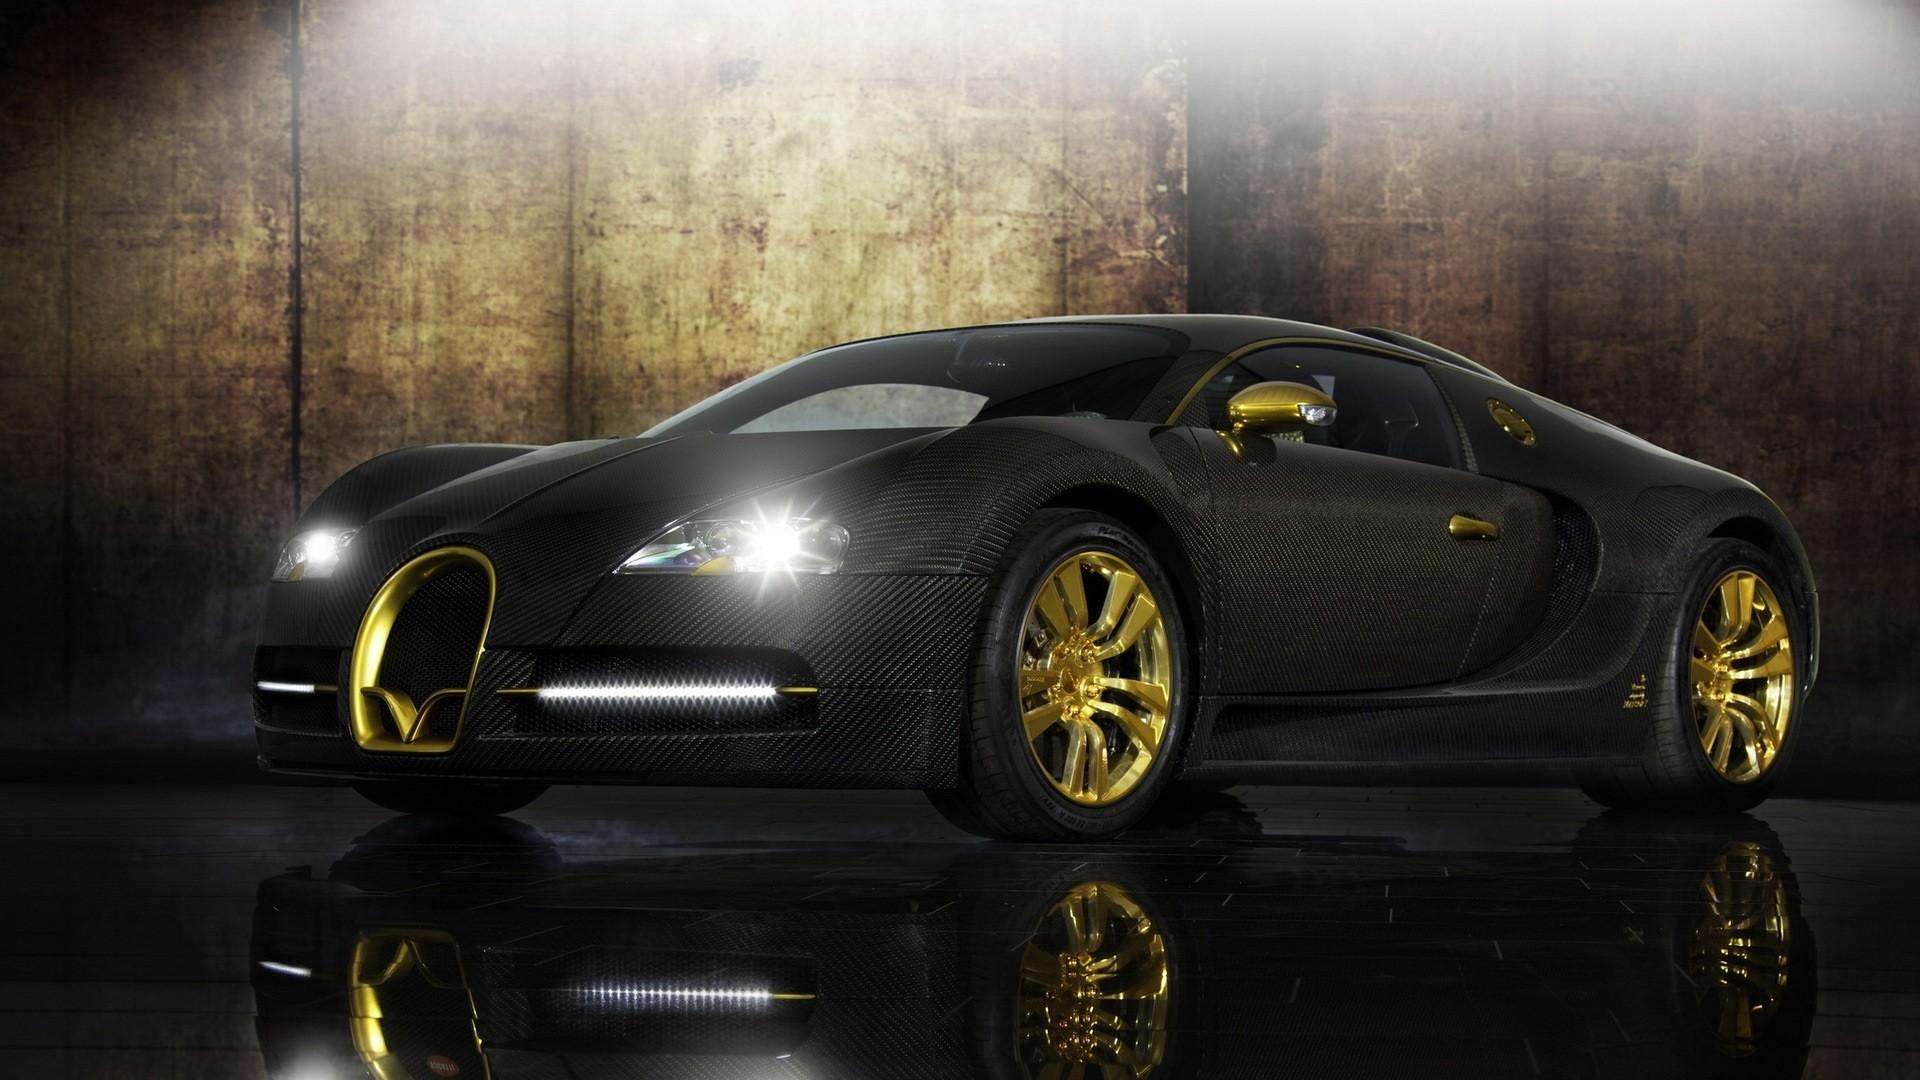 Bugatti Veyron black supercar 4k Ultra HD Wallpaper